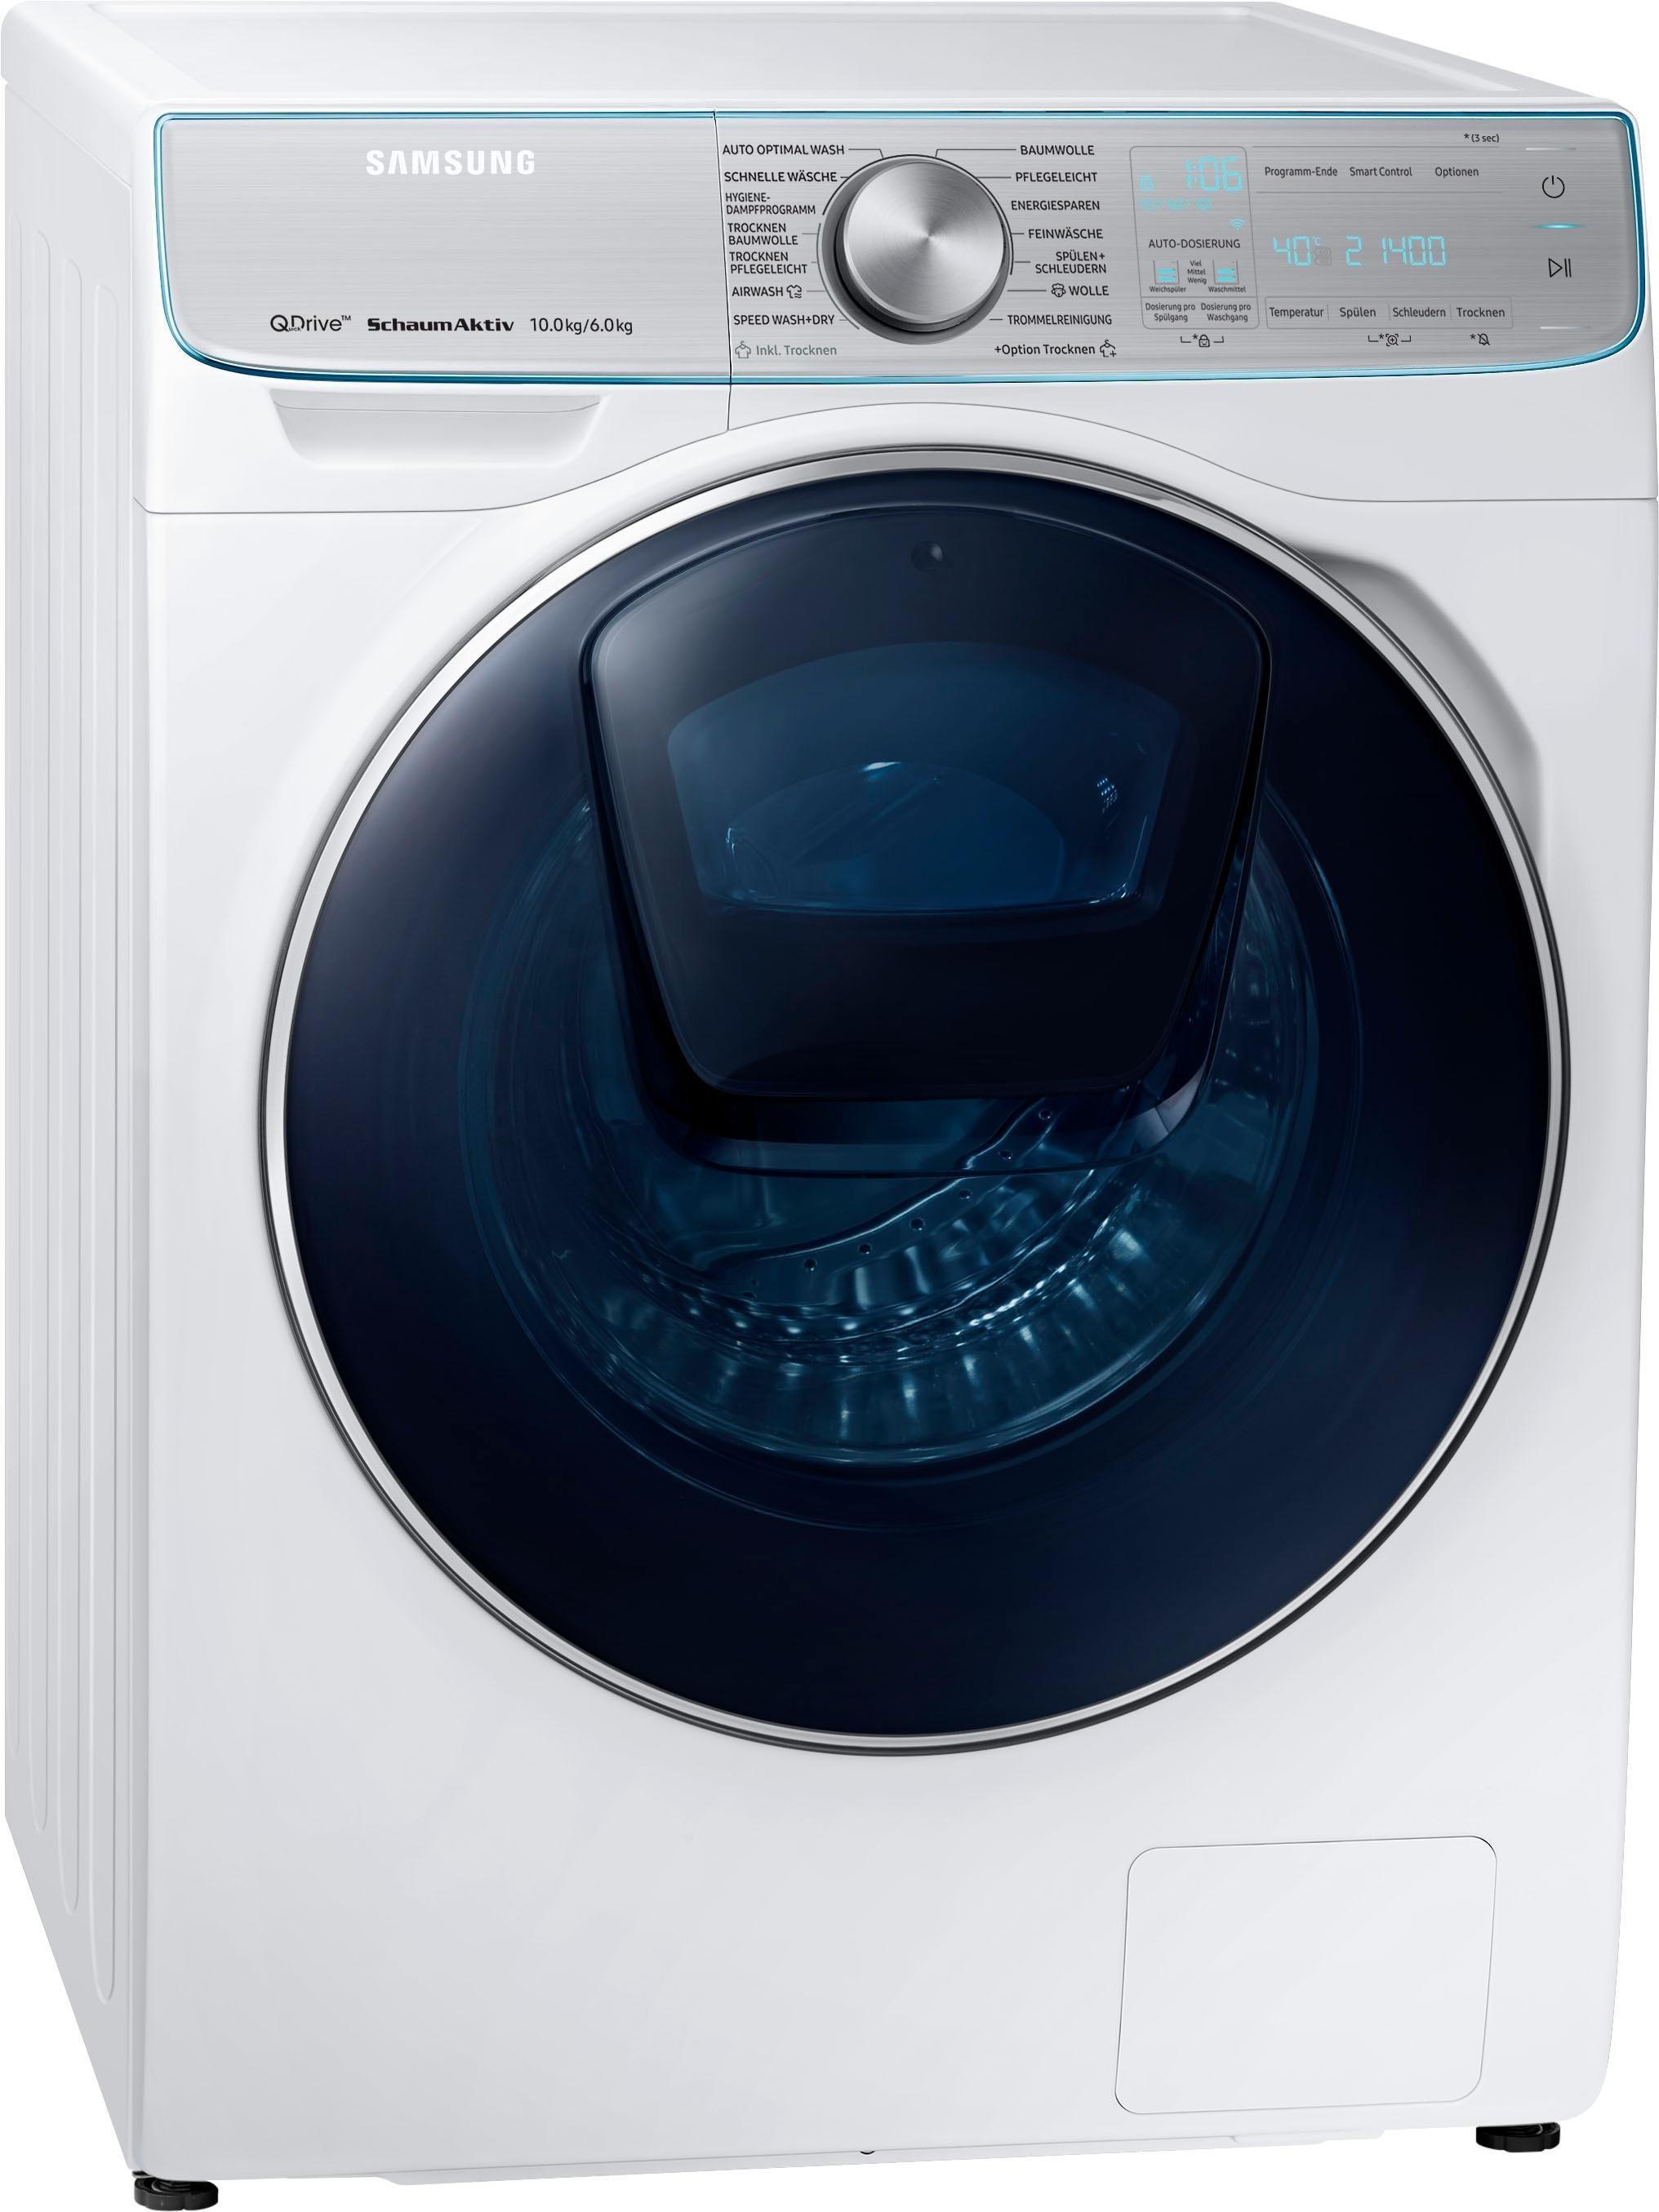 Samsung Waschtrockner WD8800 QuickDrive WD10N84INOA/EG, 10 kg/6 kg, 1400 U/Min, AddWash